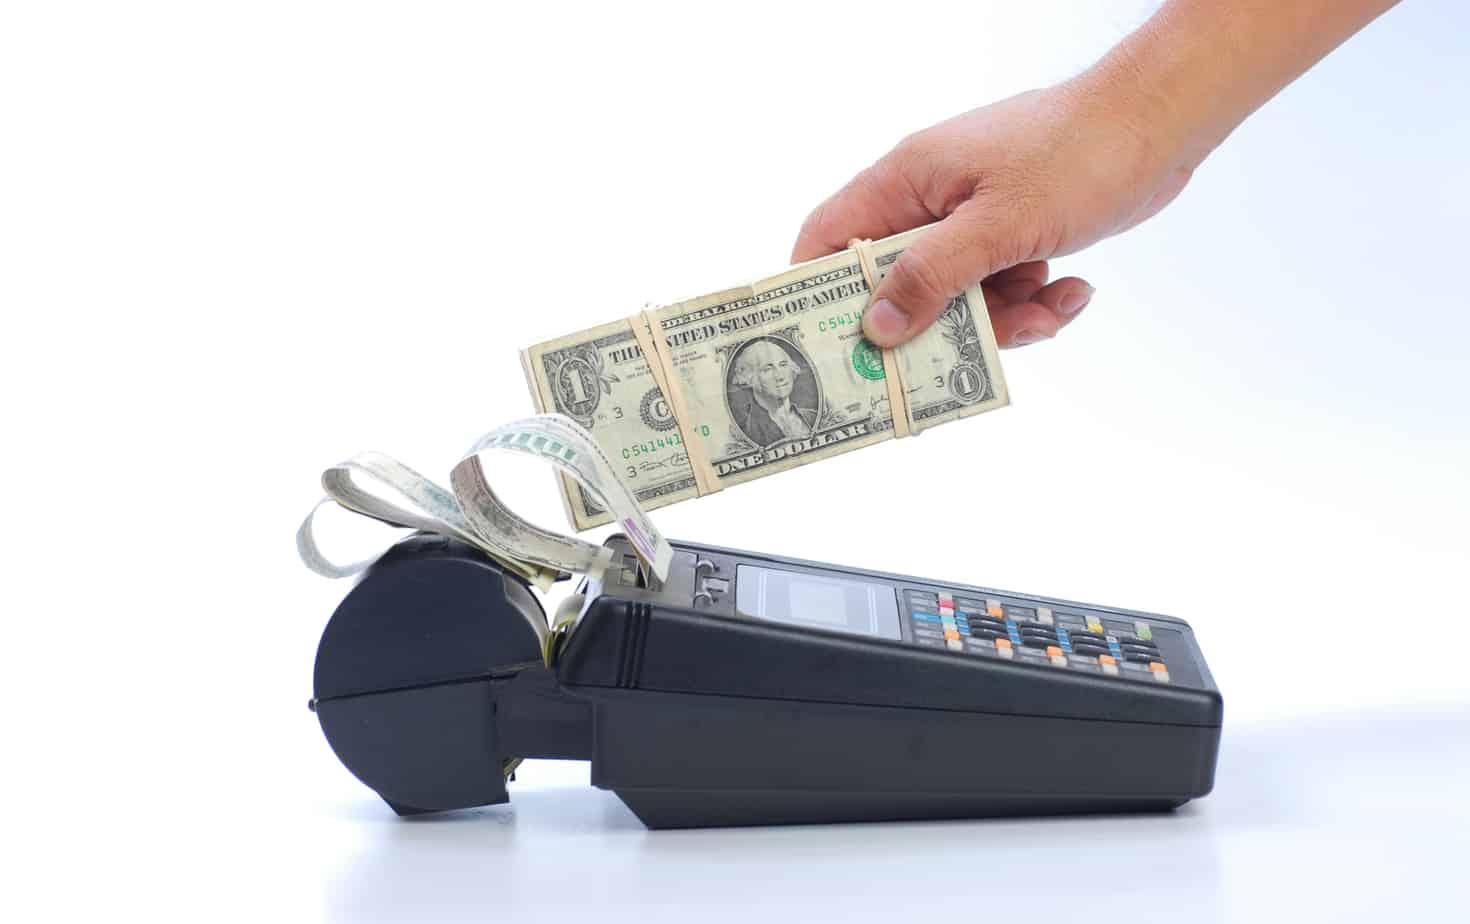 cash on credit card machine 16156434